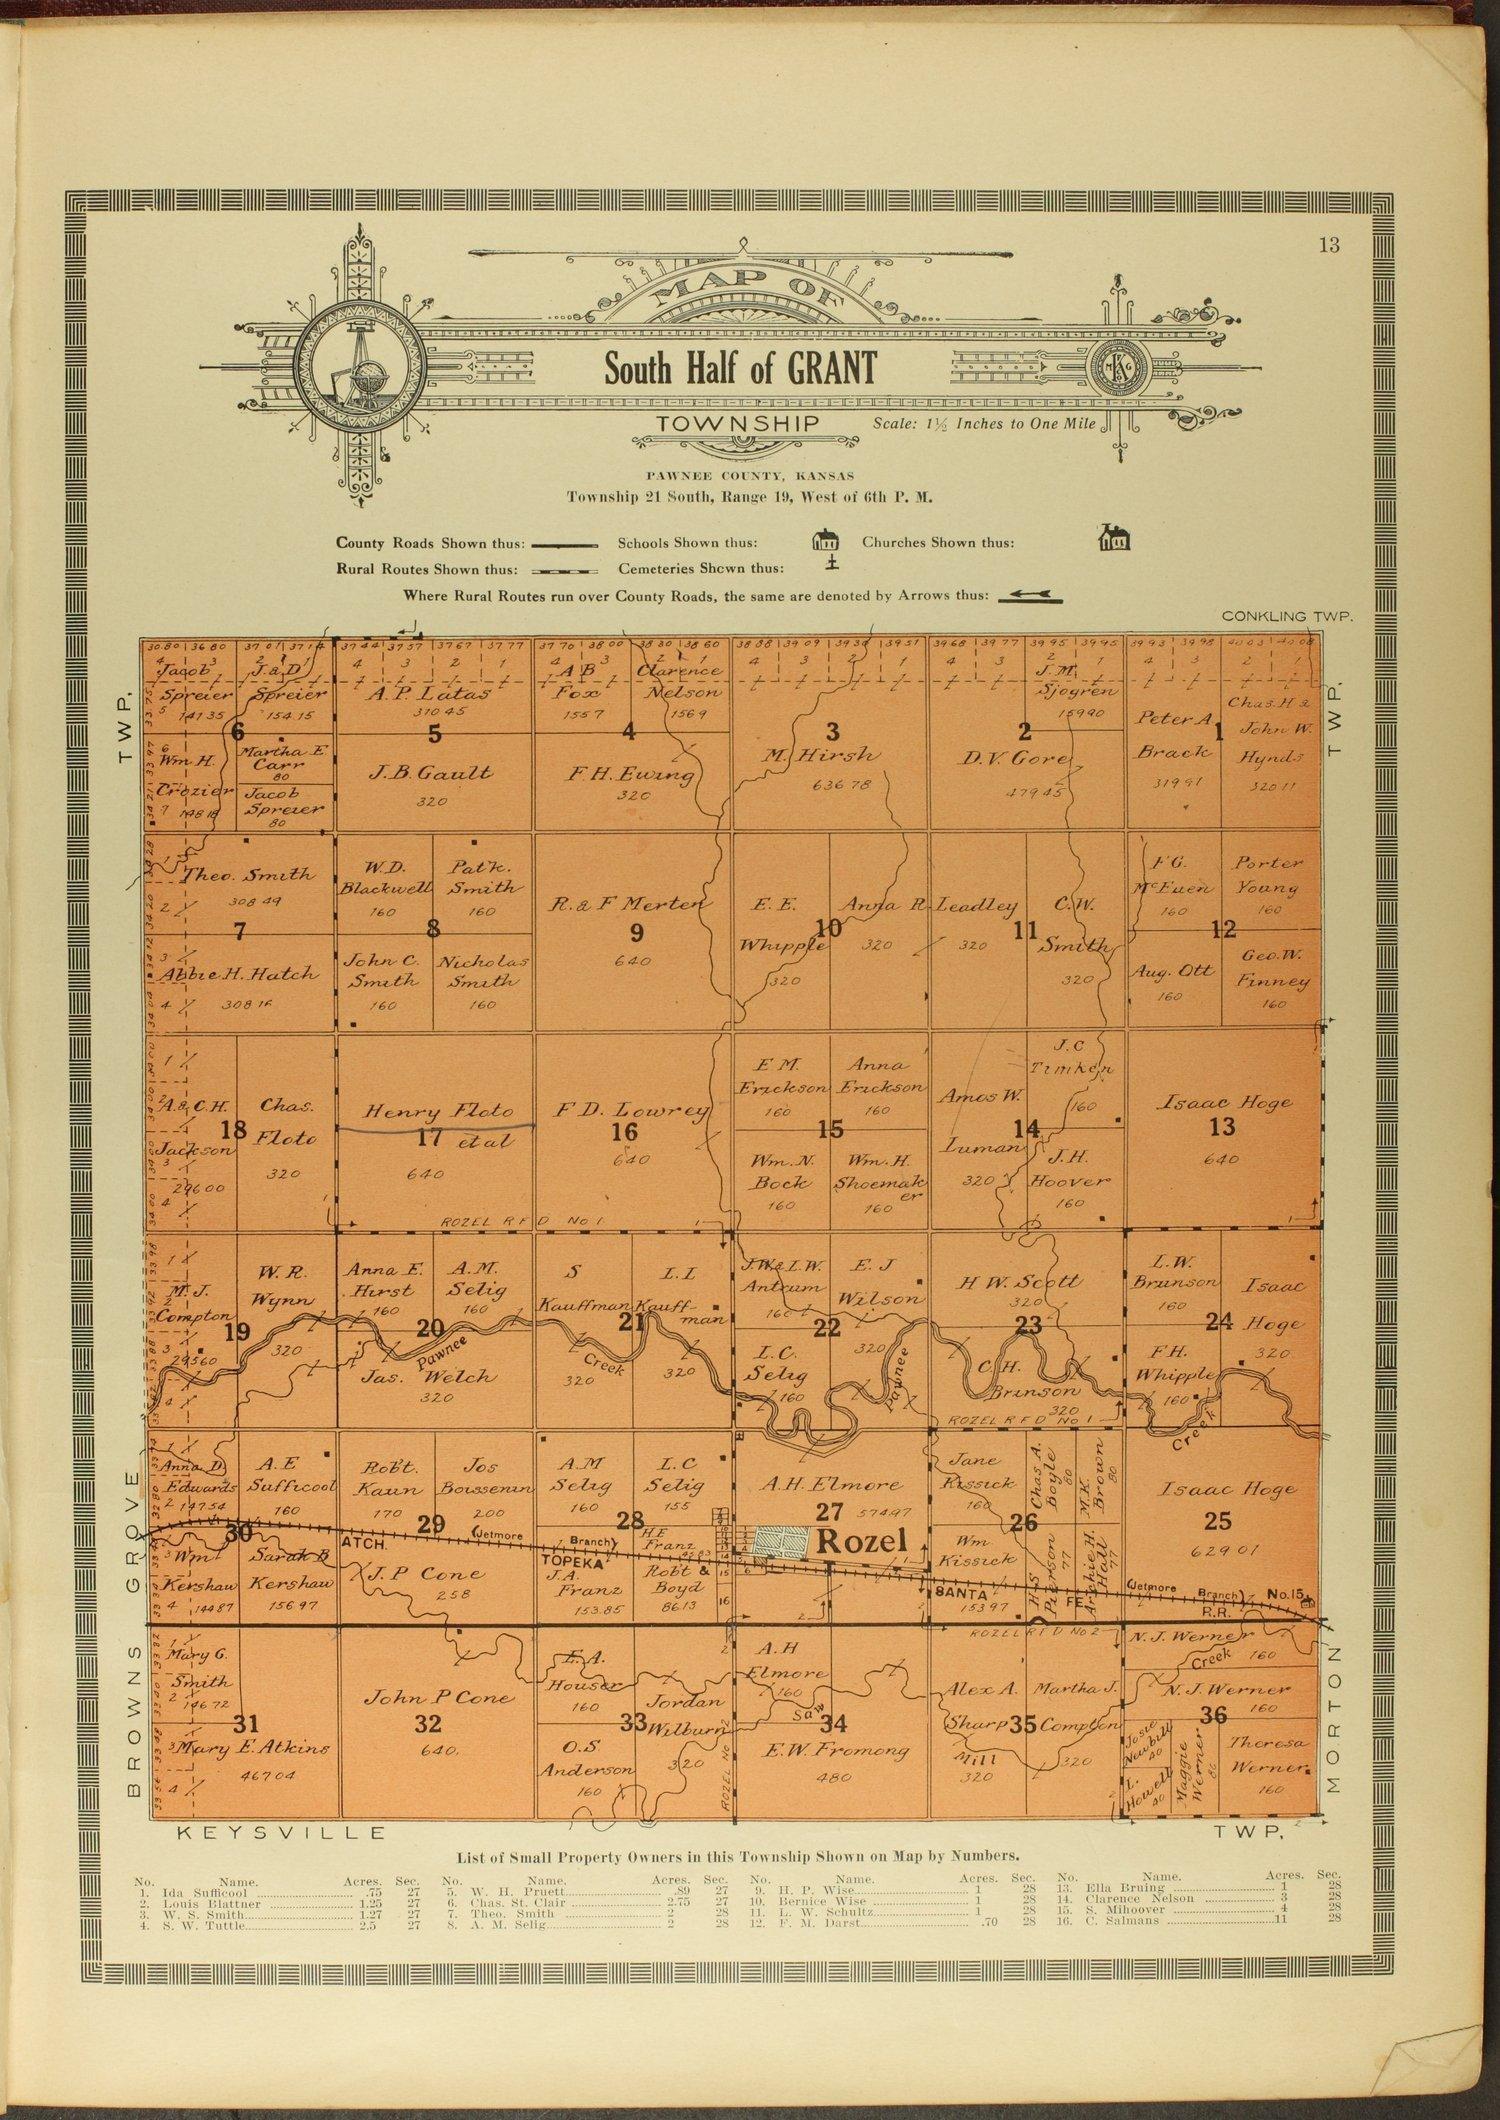 Atlas and plat book of Pawnee County, Kansas - 13